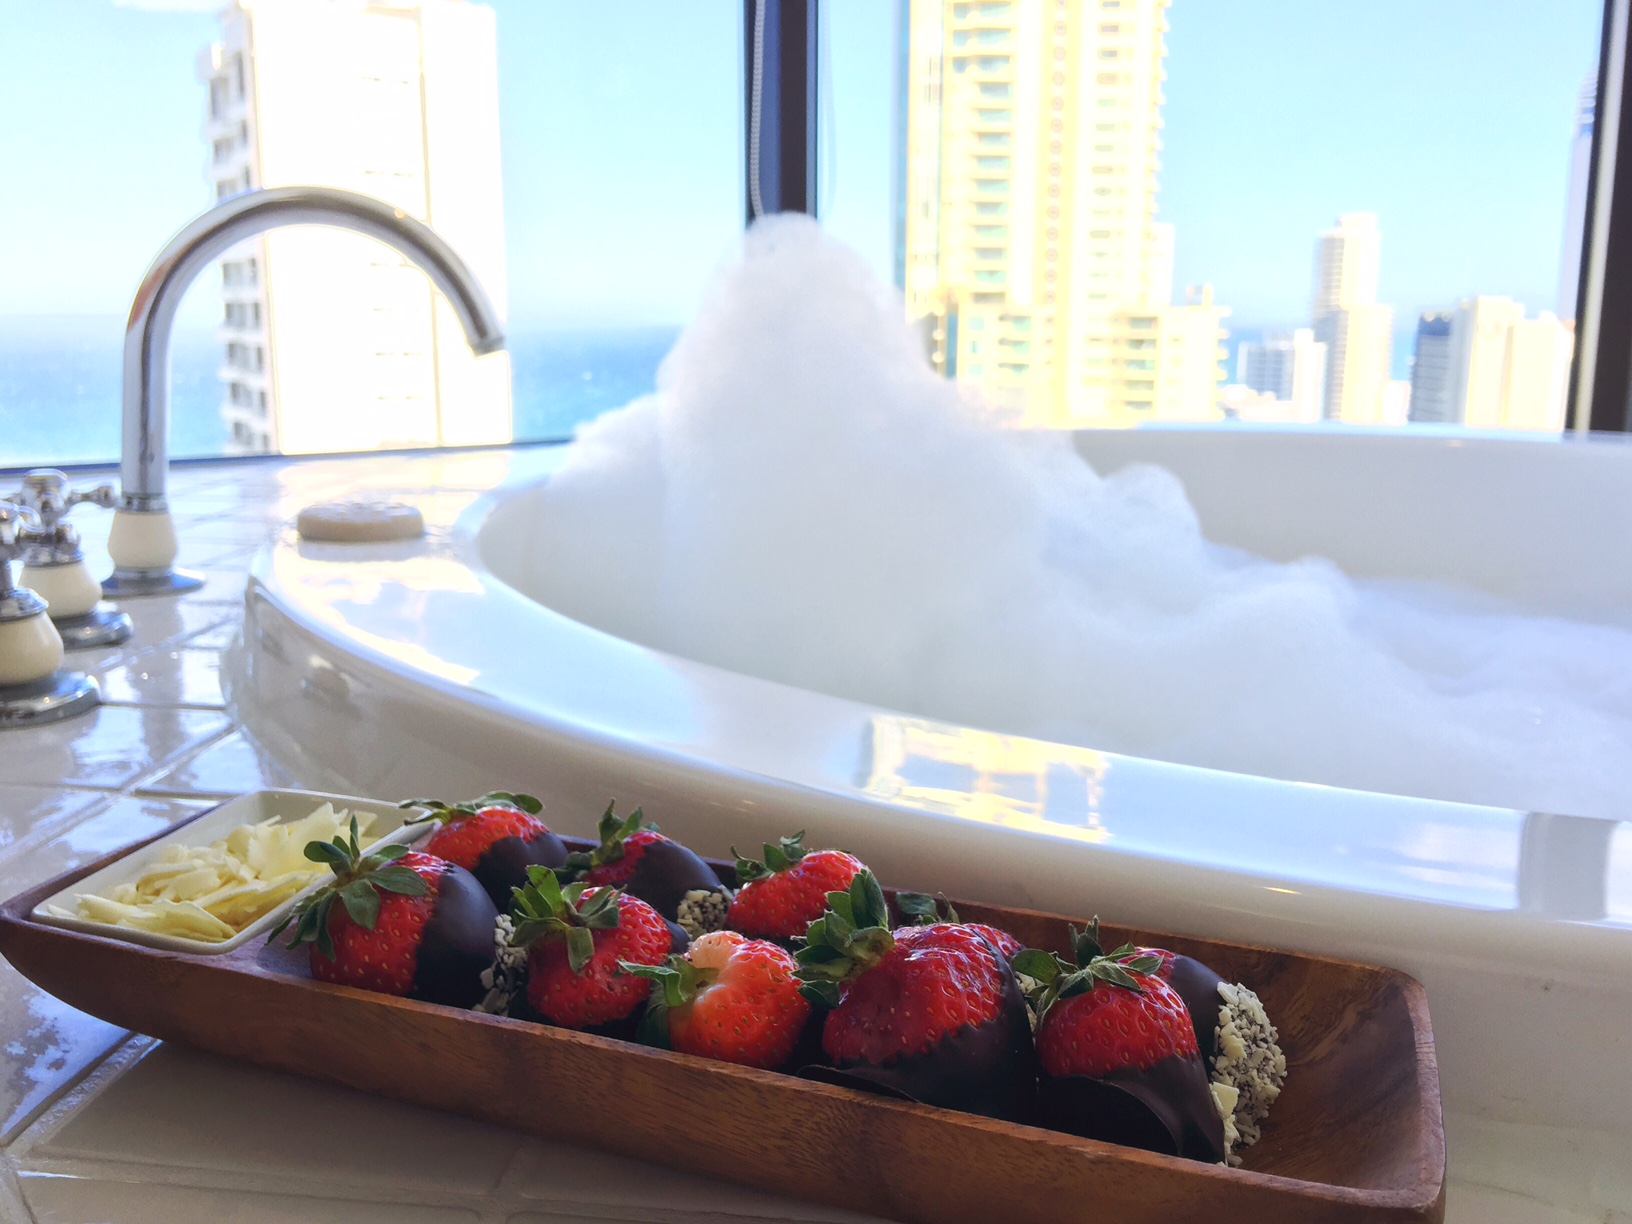 chocolate covered strawberries surfers paradise marriott resort and spa gold coast australia beach honeymoon romantic couples holiday luxury vacation